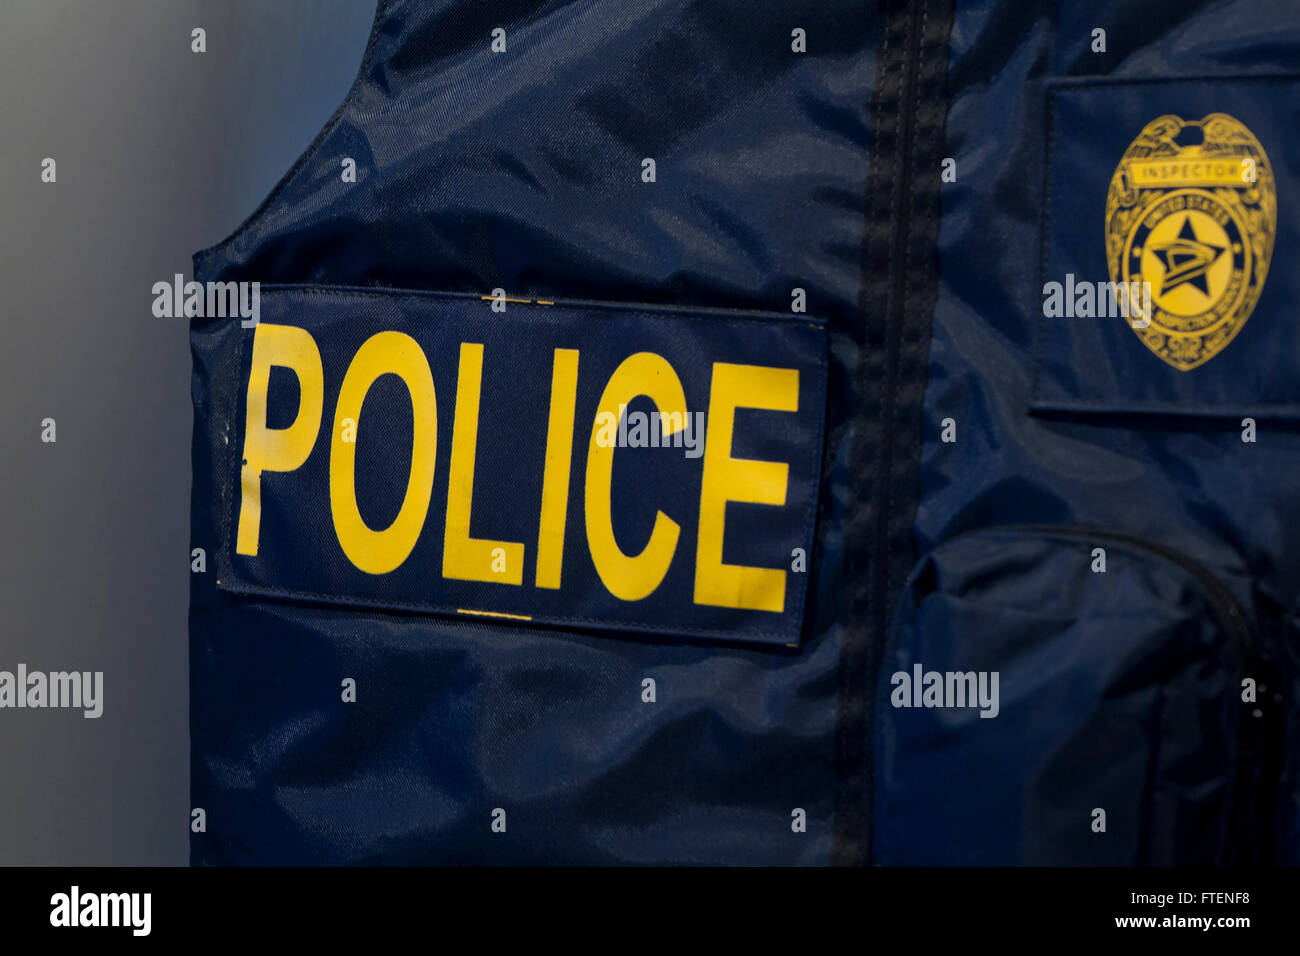 Police vest - USA Stock Photo